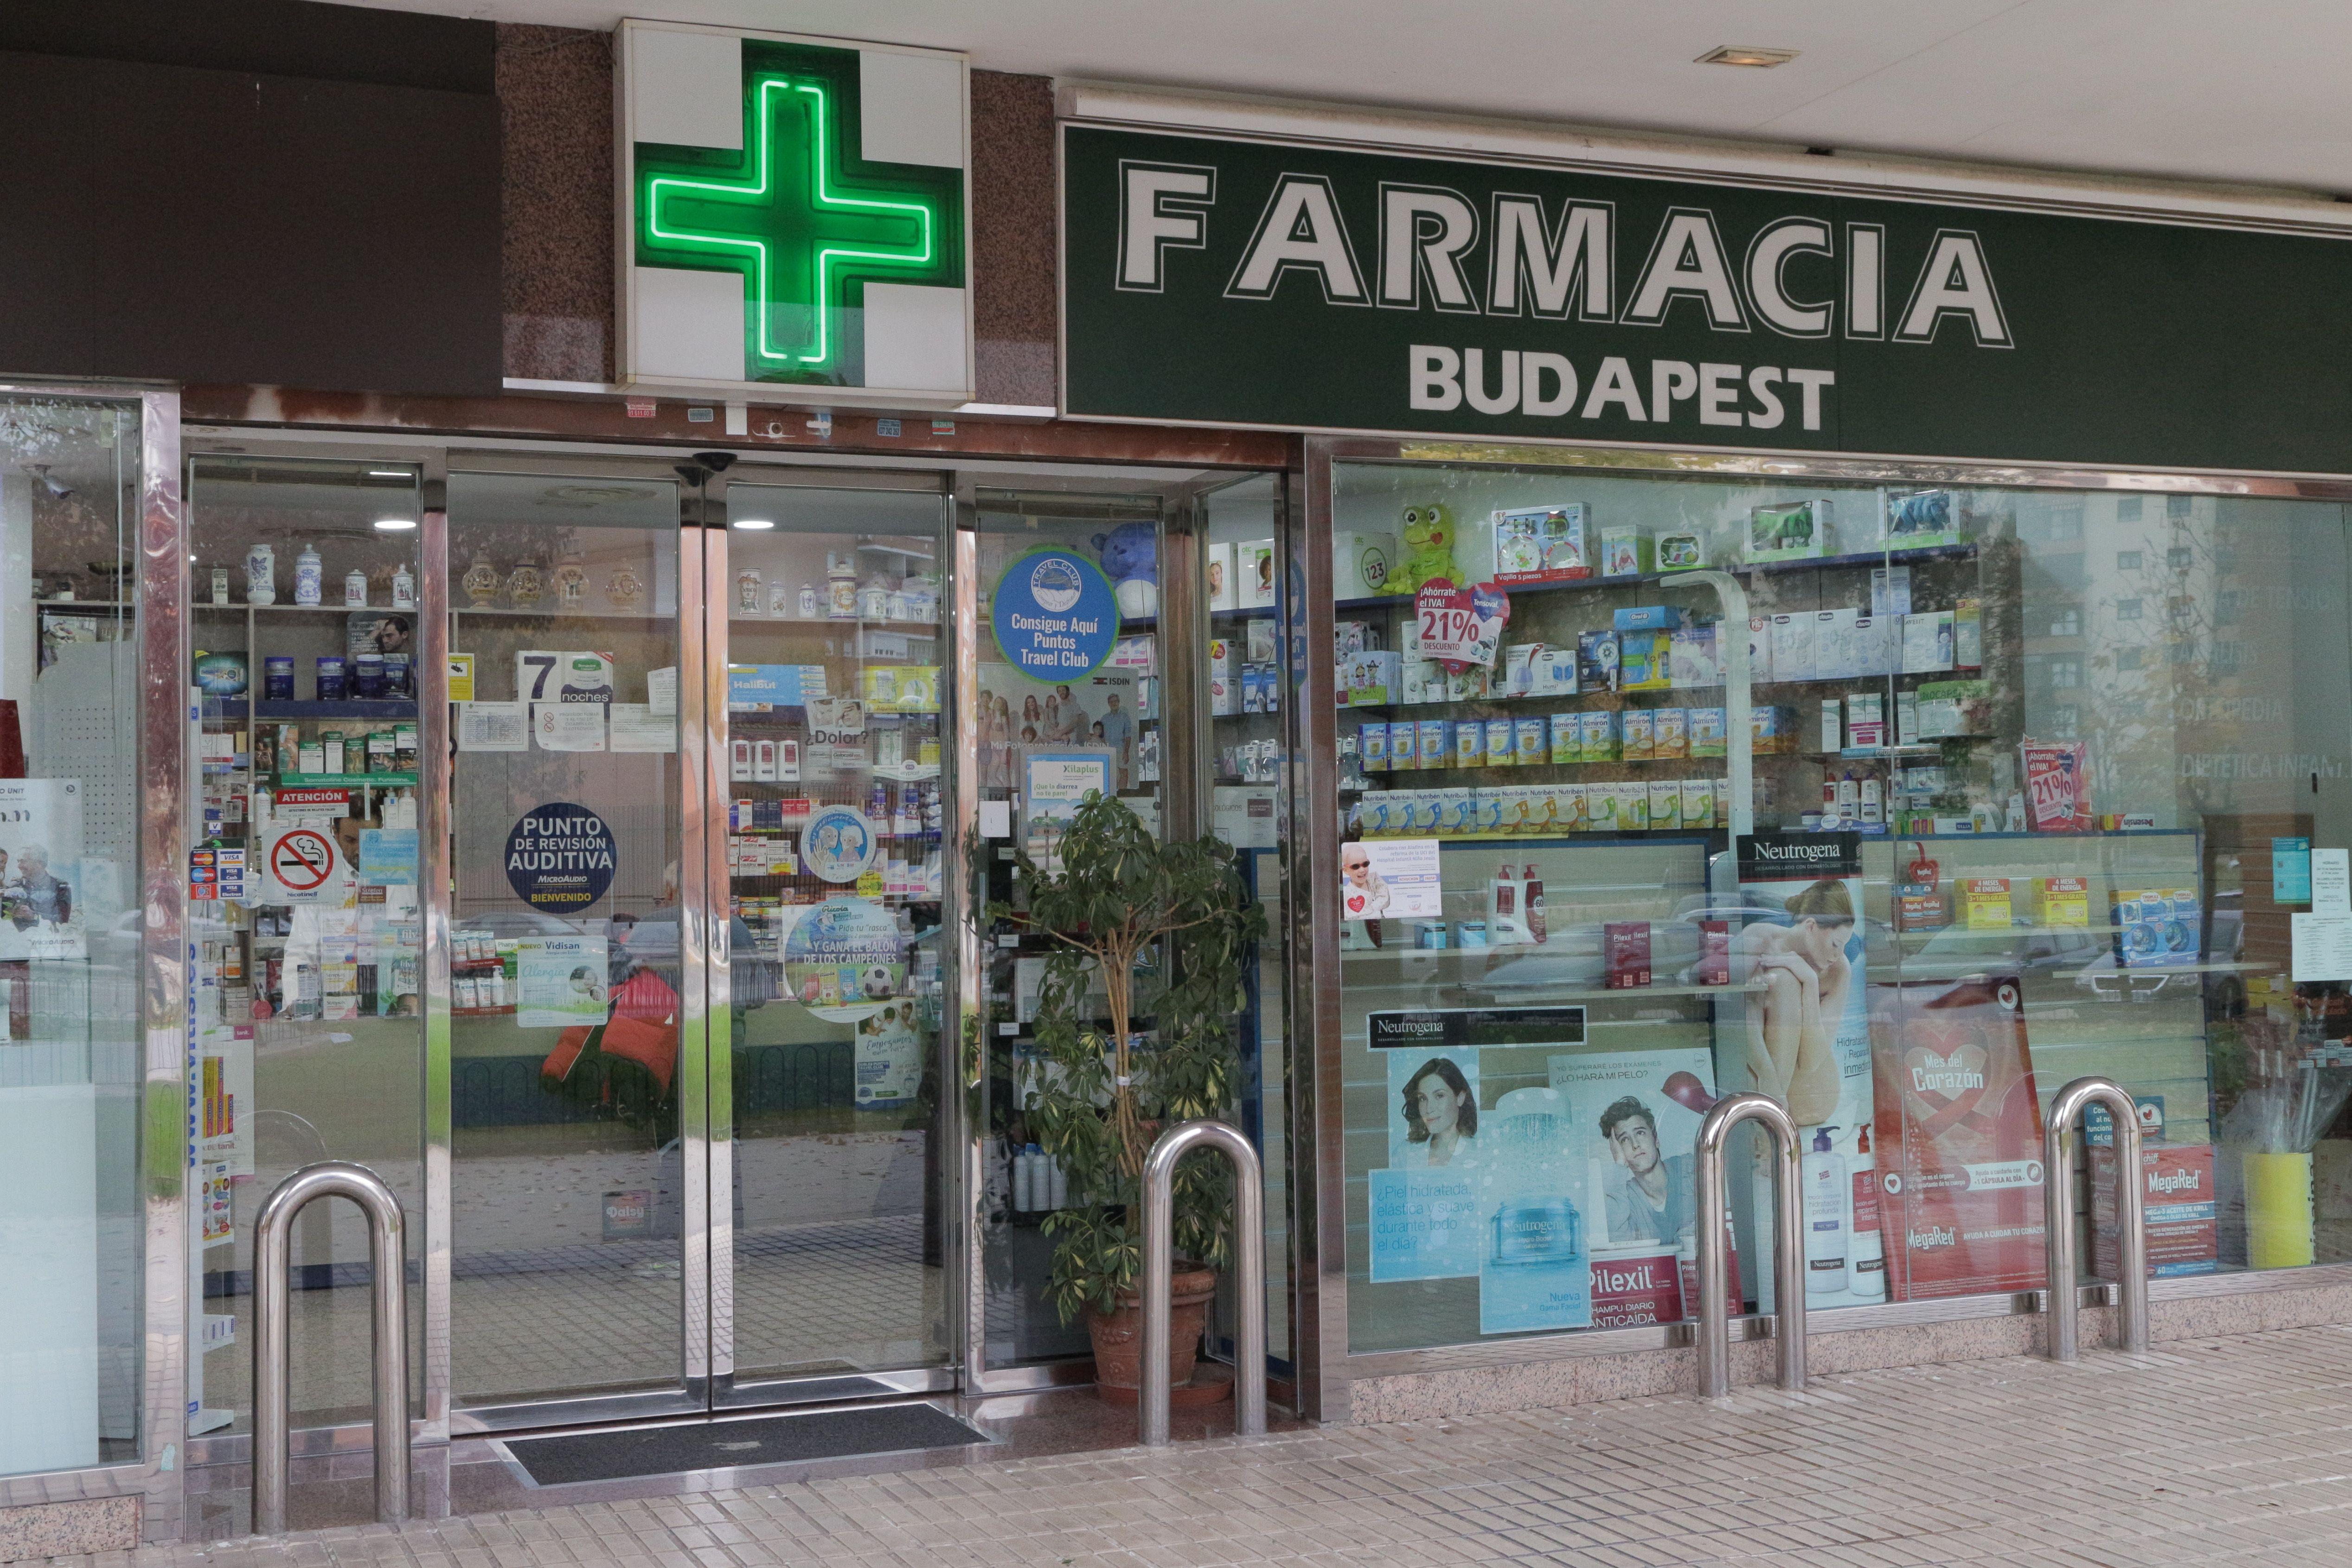 Foto 11 de Farmacias en Torrejón de Ardoz | Farmacia Budapest - Multiópticas Loreto